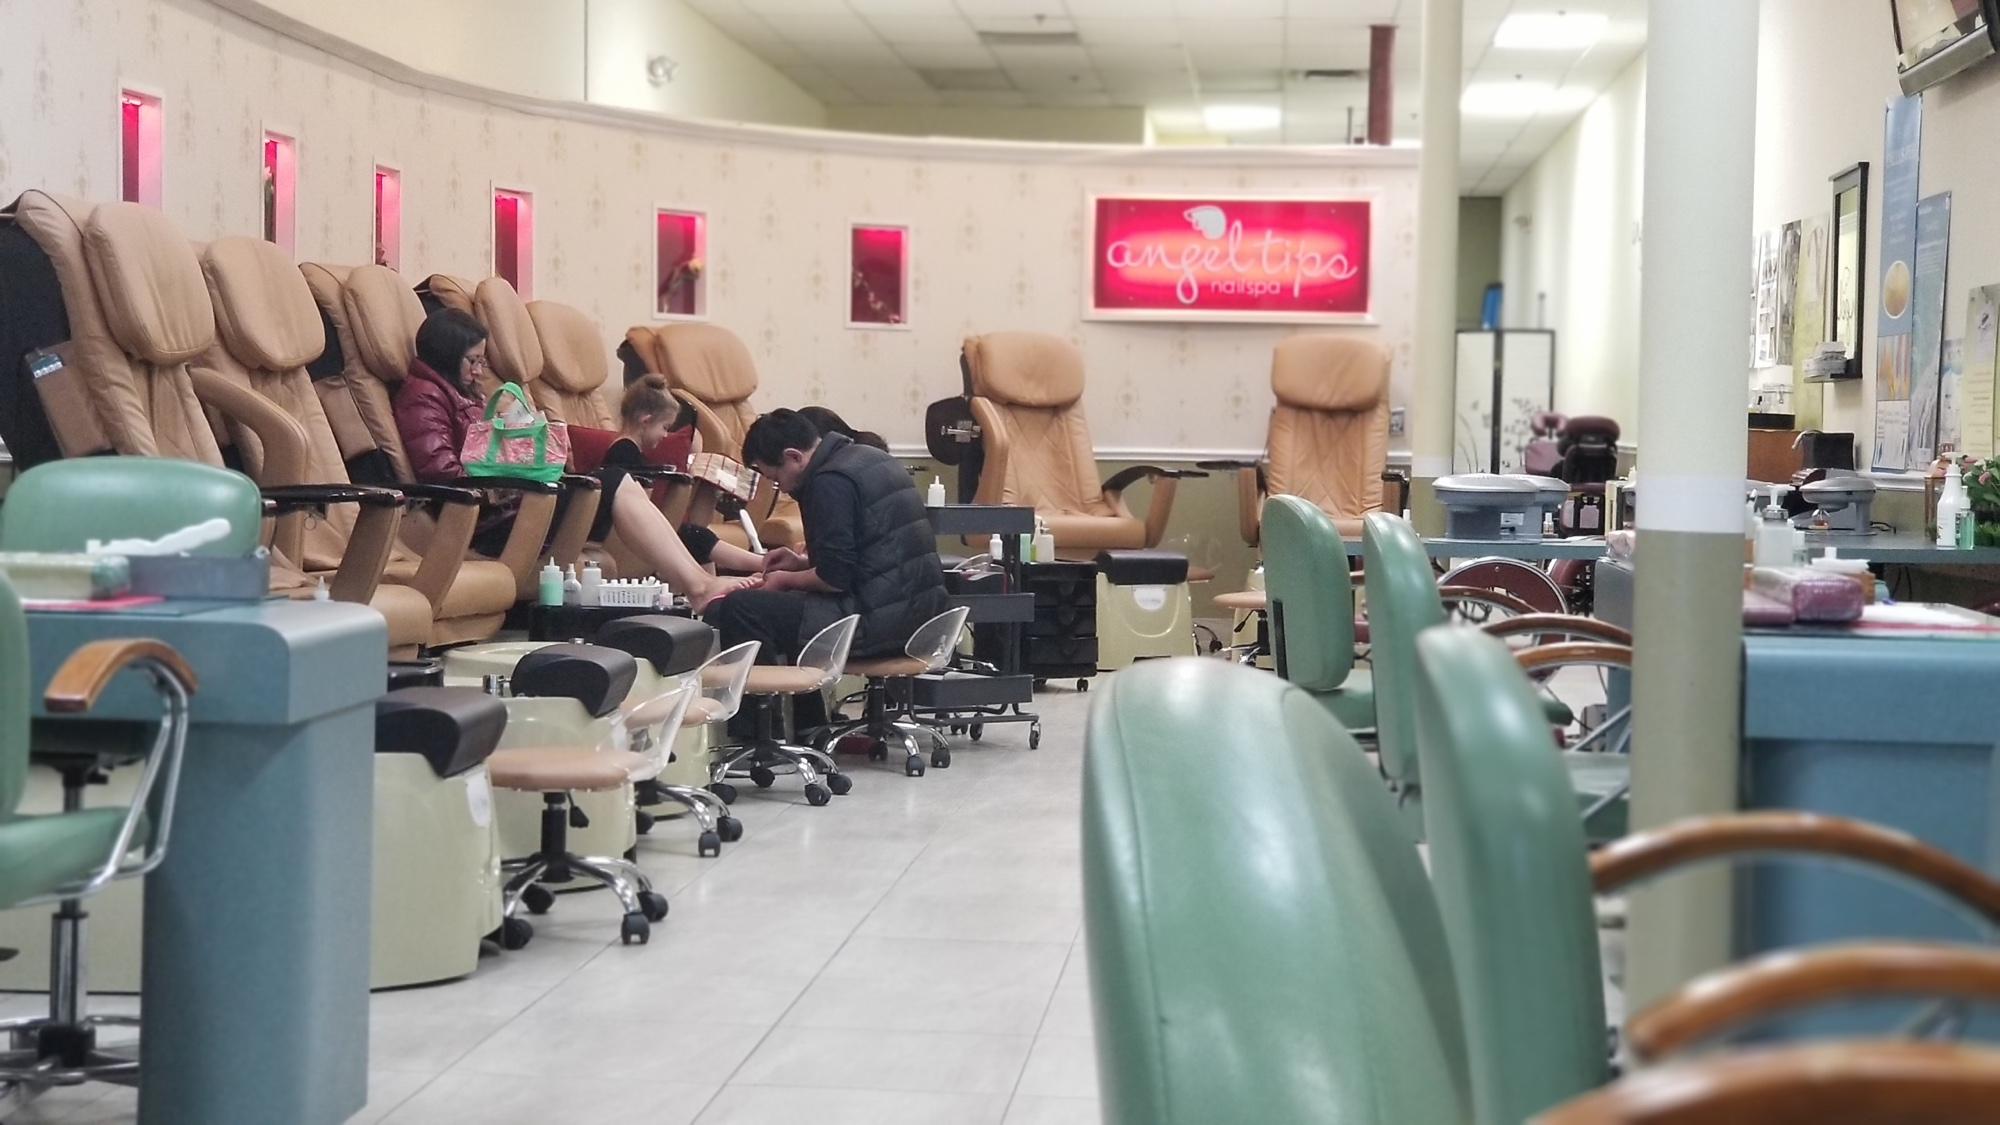 Salon image